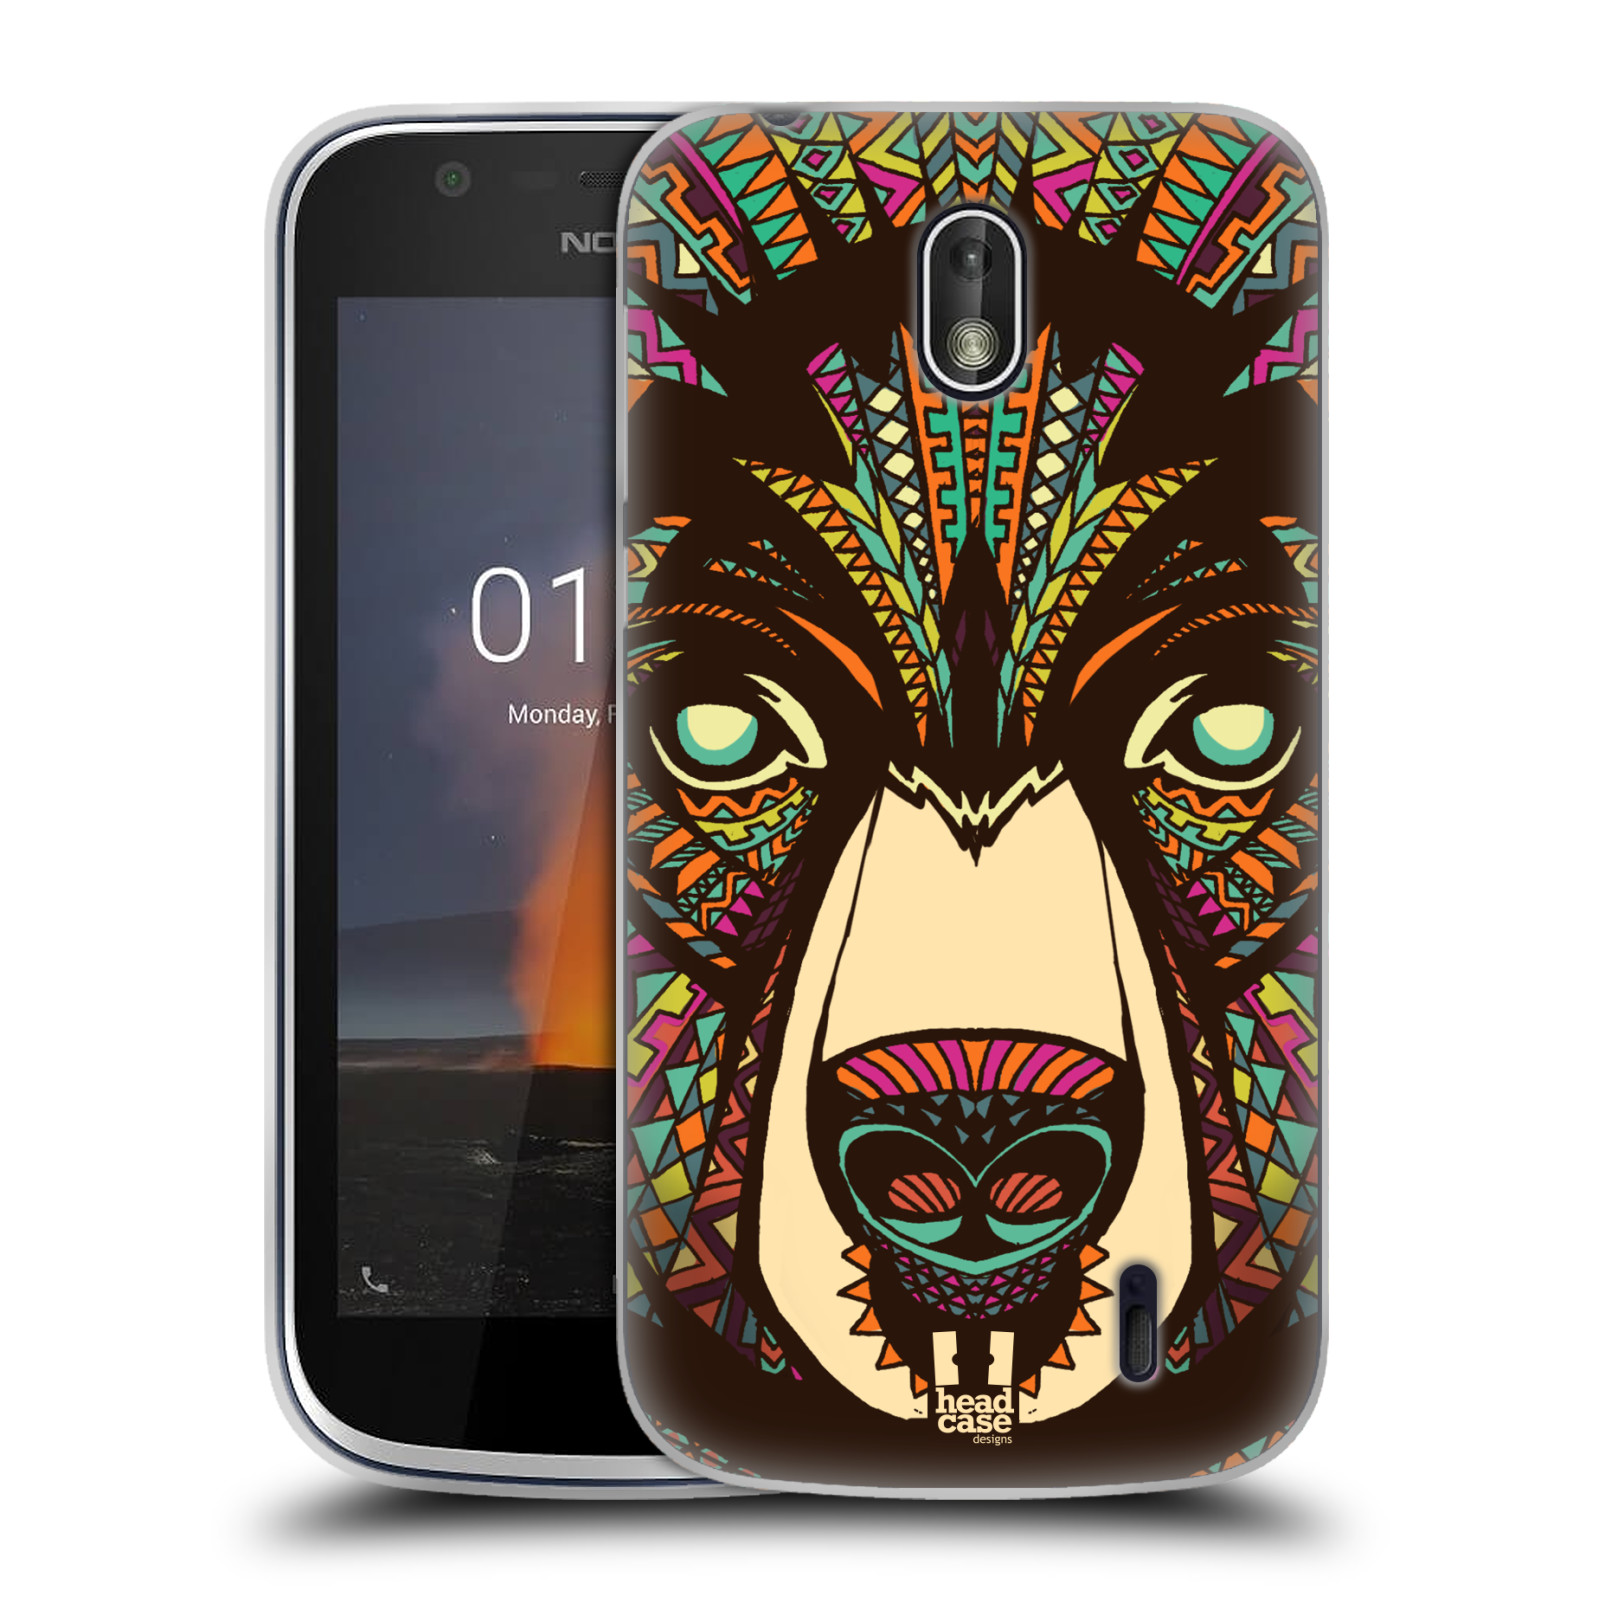 Silikonové pouzdro na mobil Nokia 1 - Head Case - AZTEC MEDVĚD